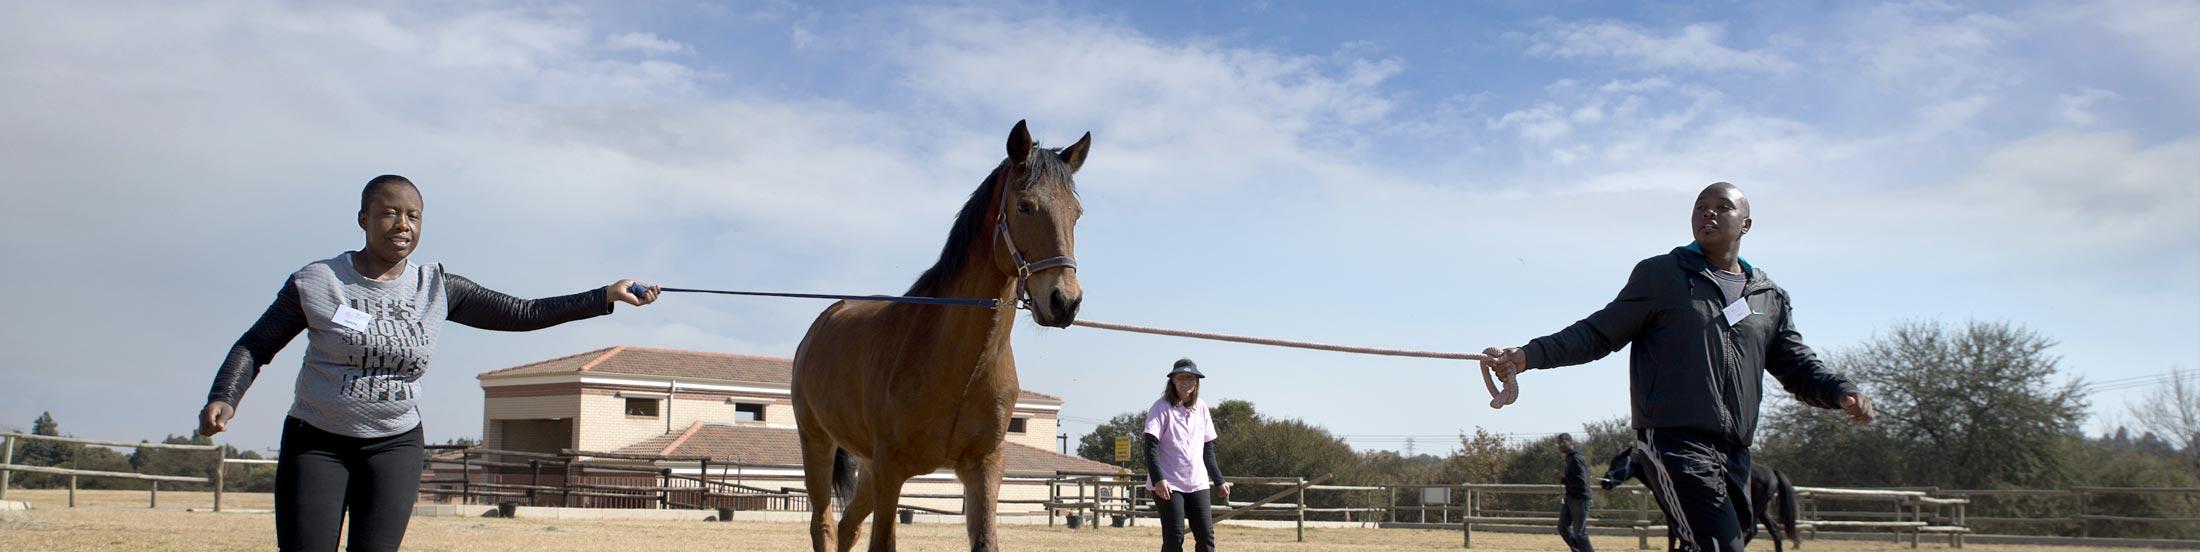 Self development with horses